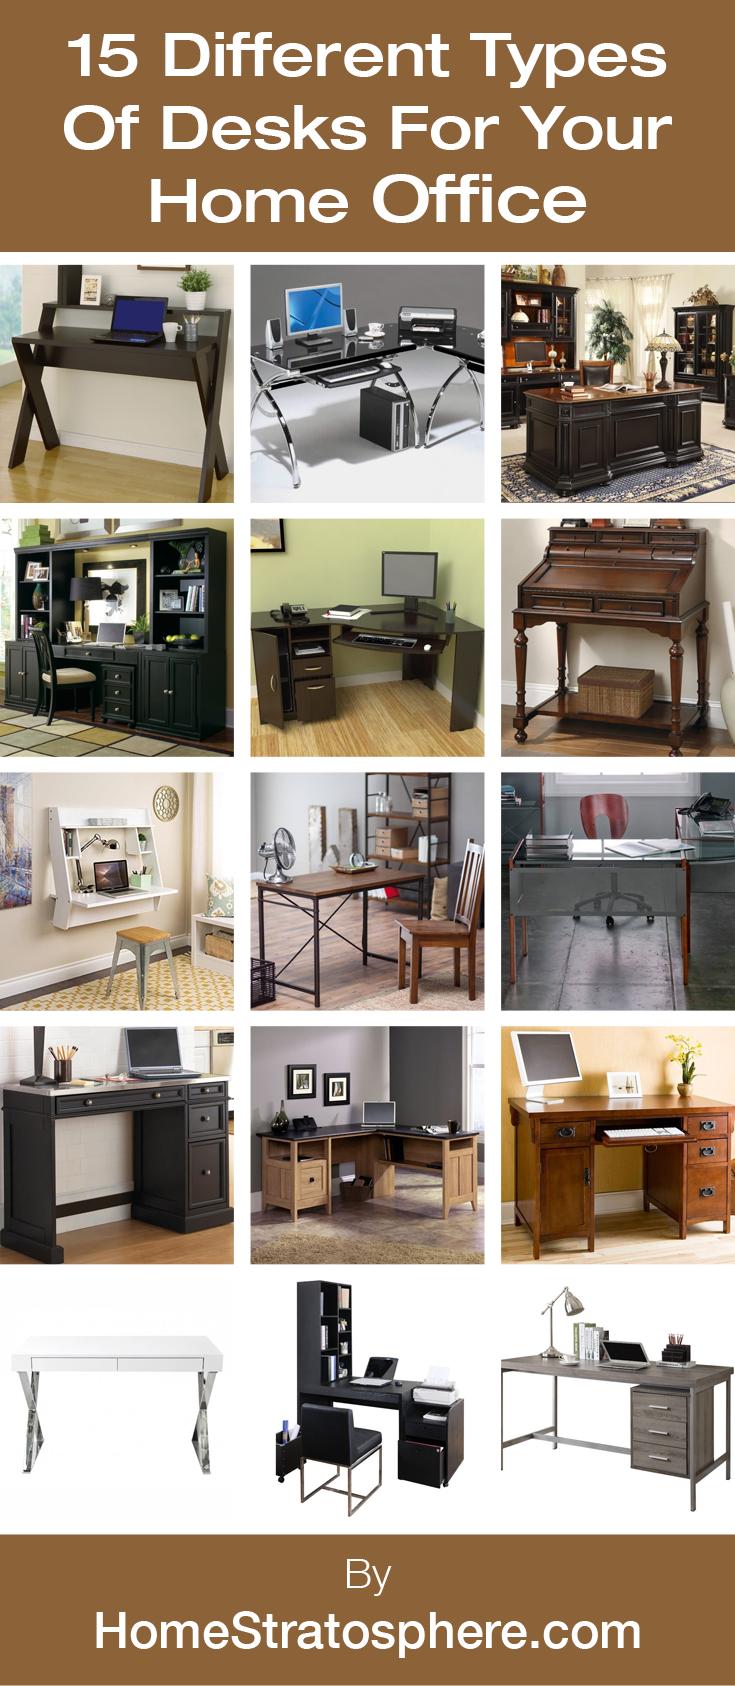 17 Different Types Of Desks 2020 Desk Buying Guide Desk Home Office Home